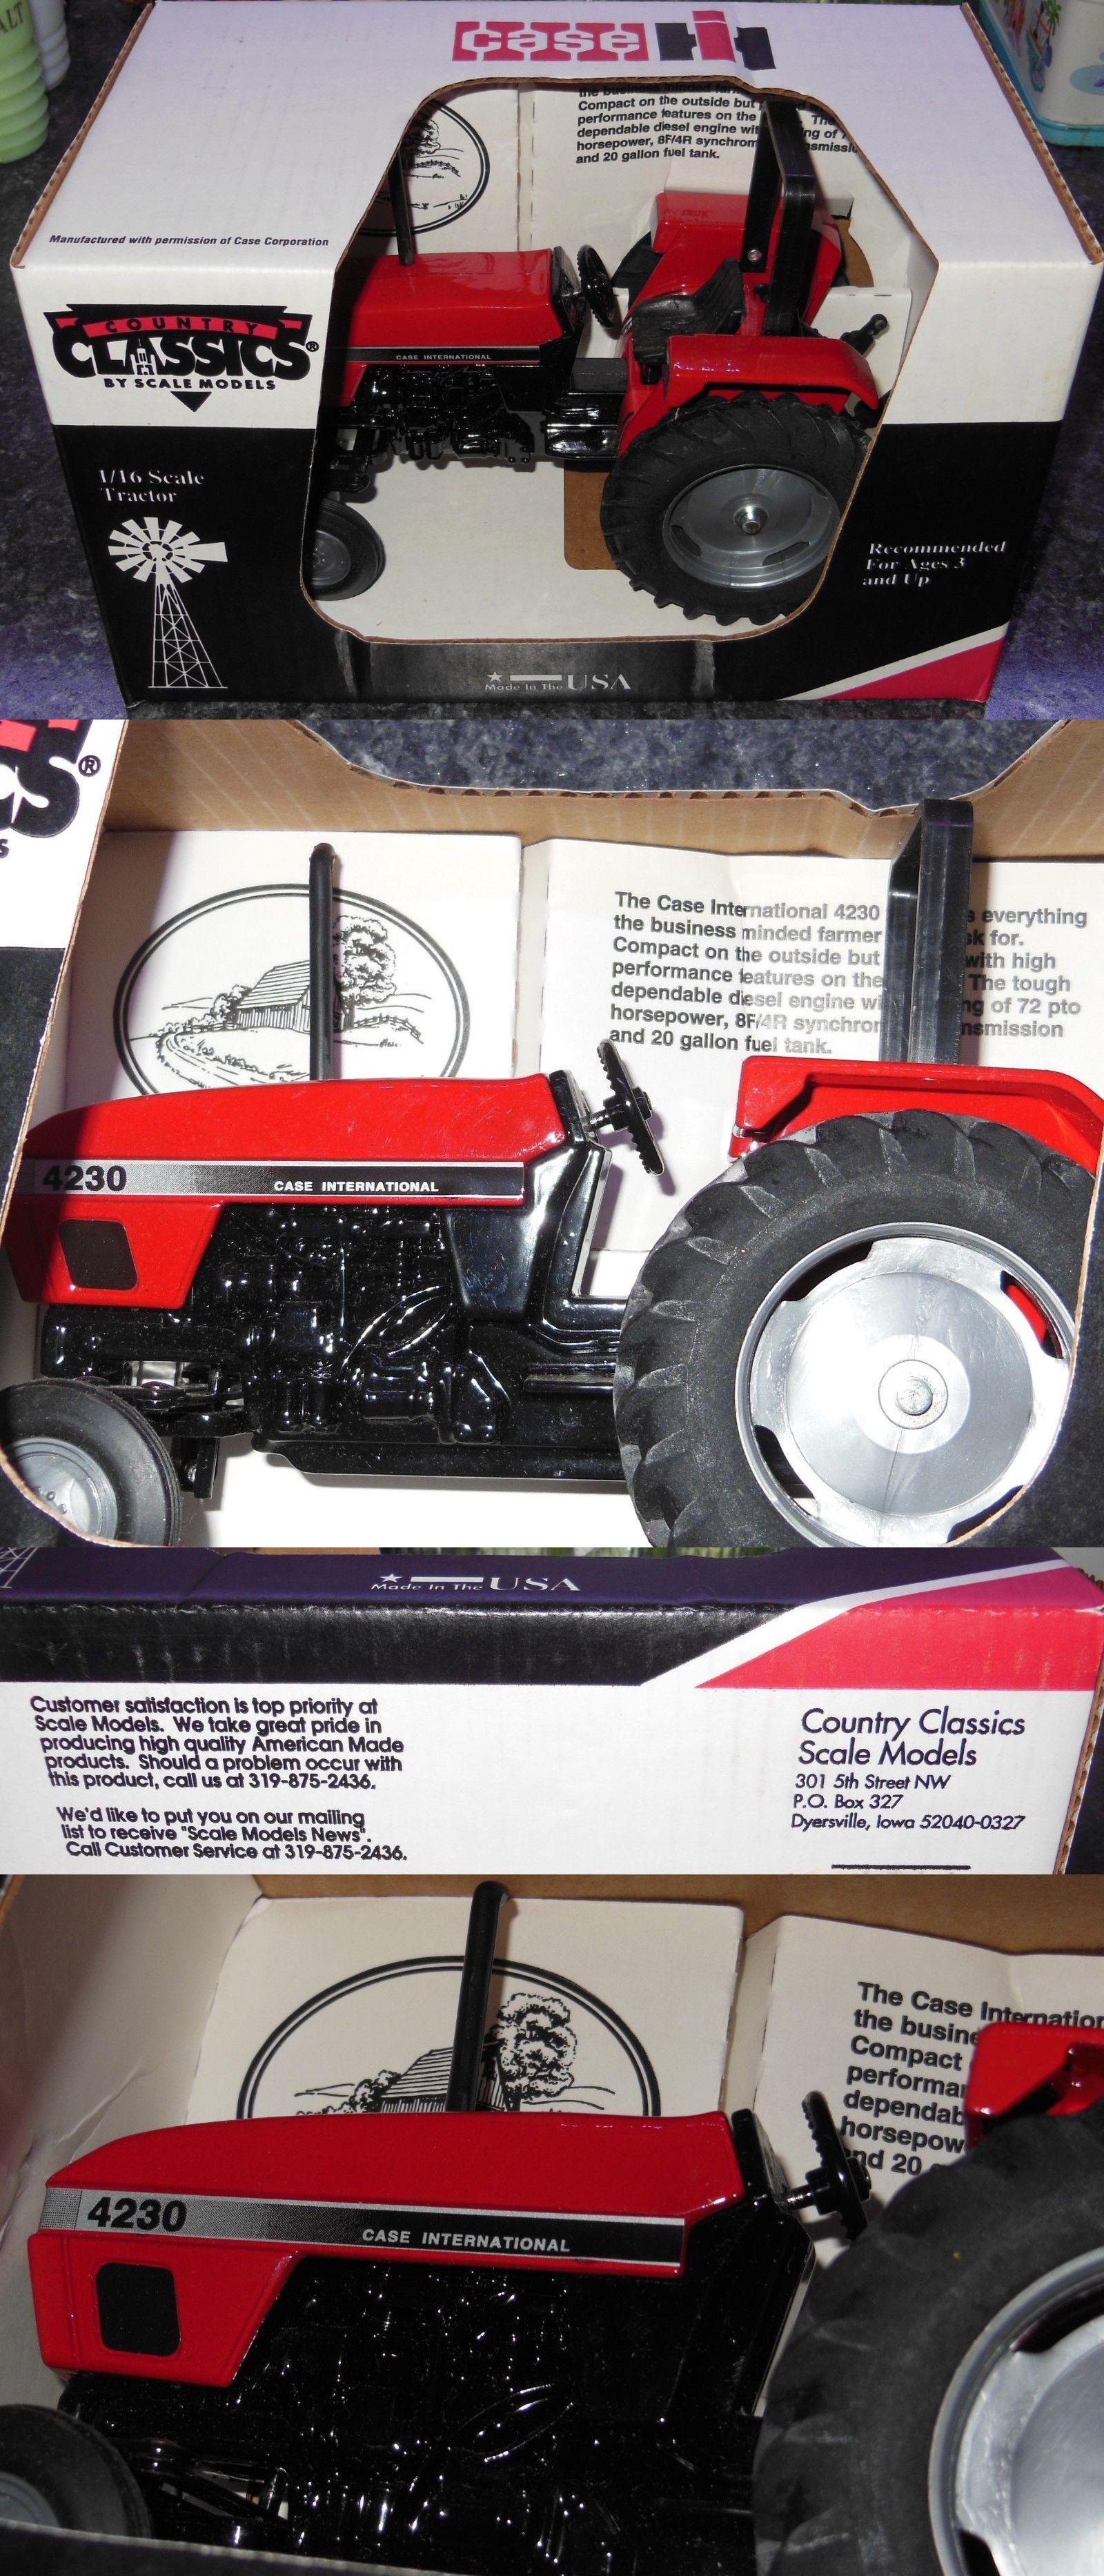 Vintage Manufacture 741: Case International 4230 Tractor